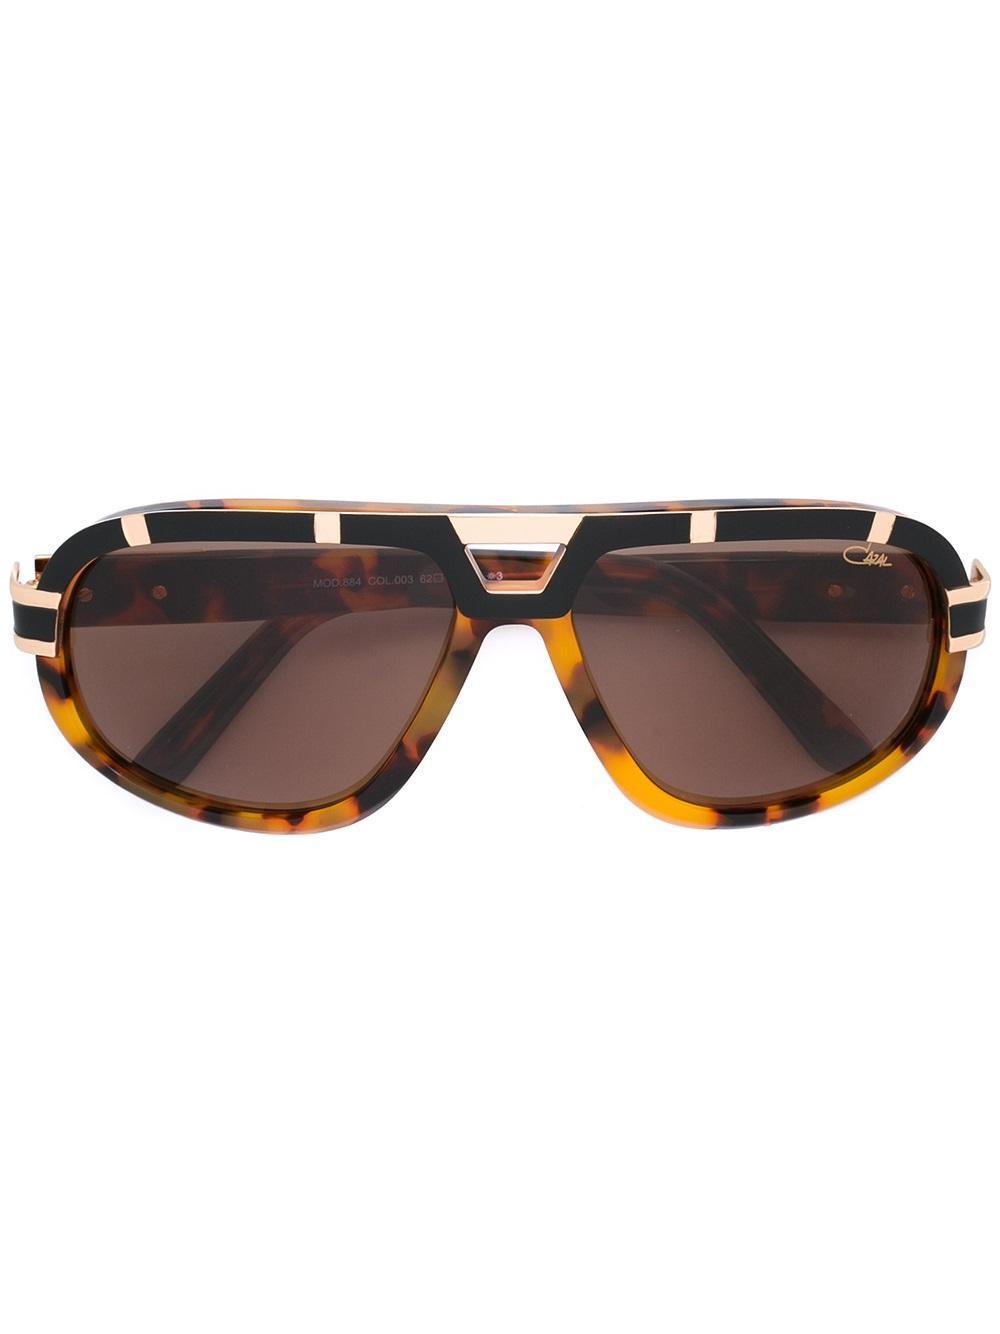 lyst cazal tortoiseshell effect sunglasses in brown. Black Bedroom Furniture Sets. Home Design Ideas